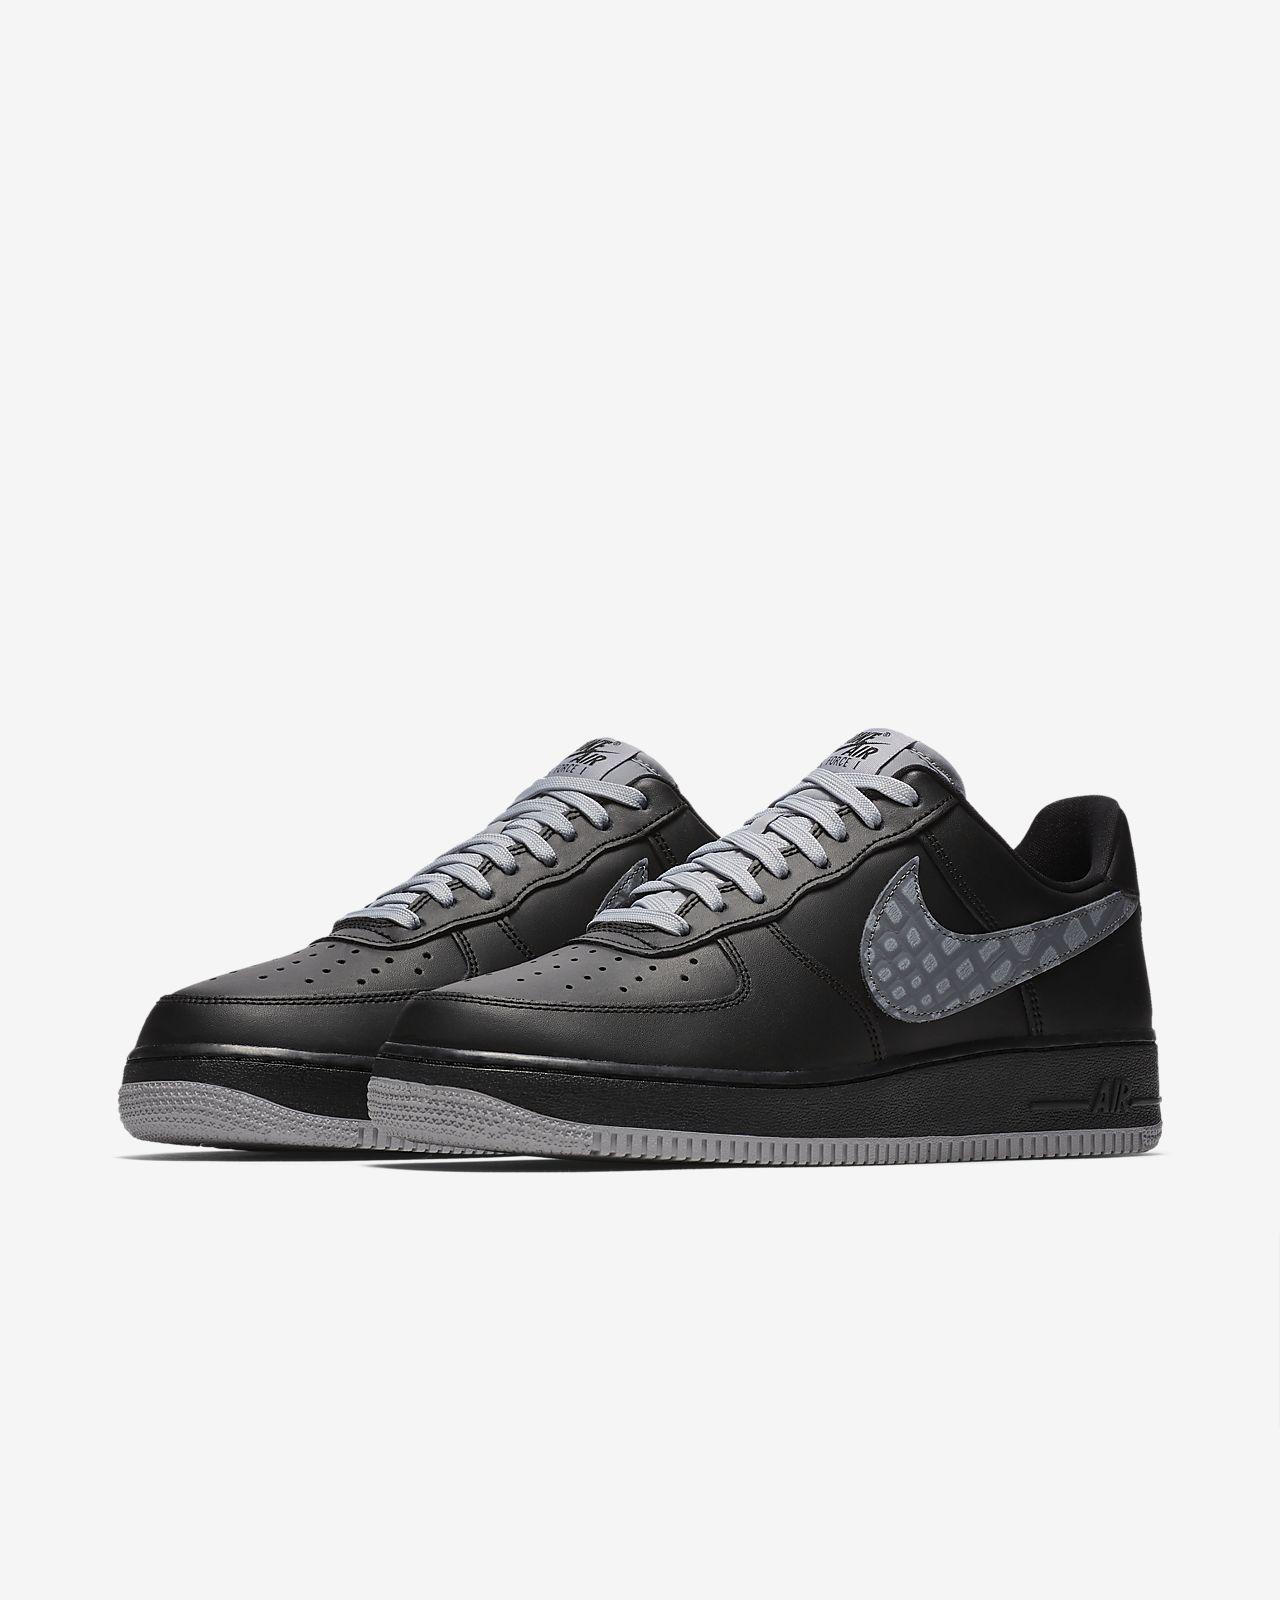 Nike Air Force 1 Low 07 LV8 Zapatillas - Hombre